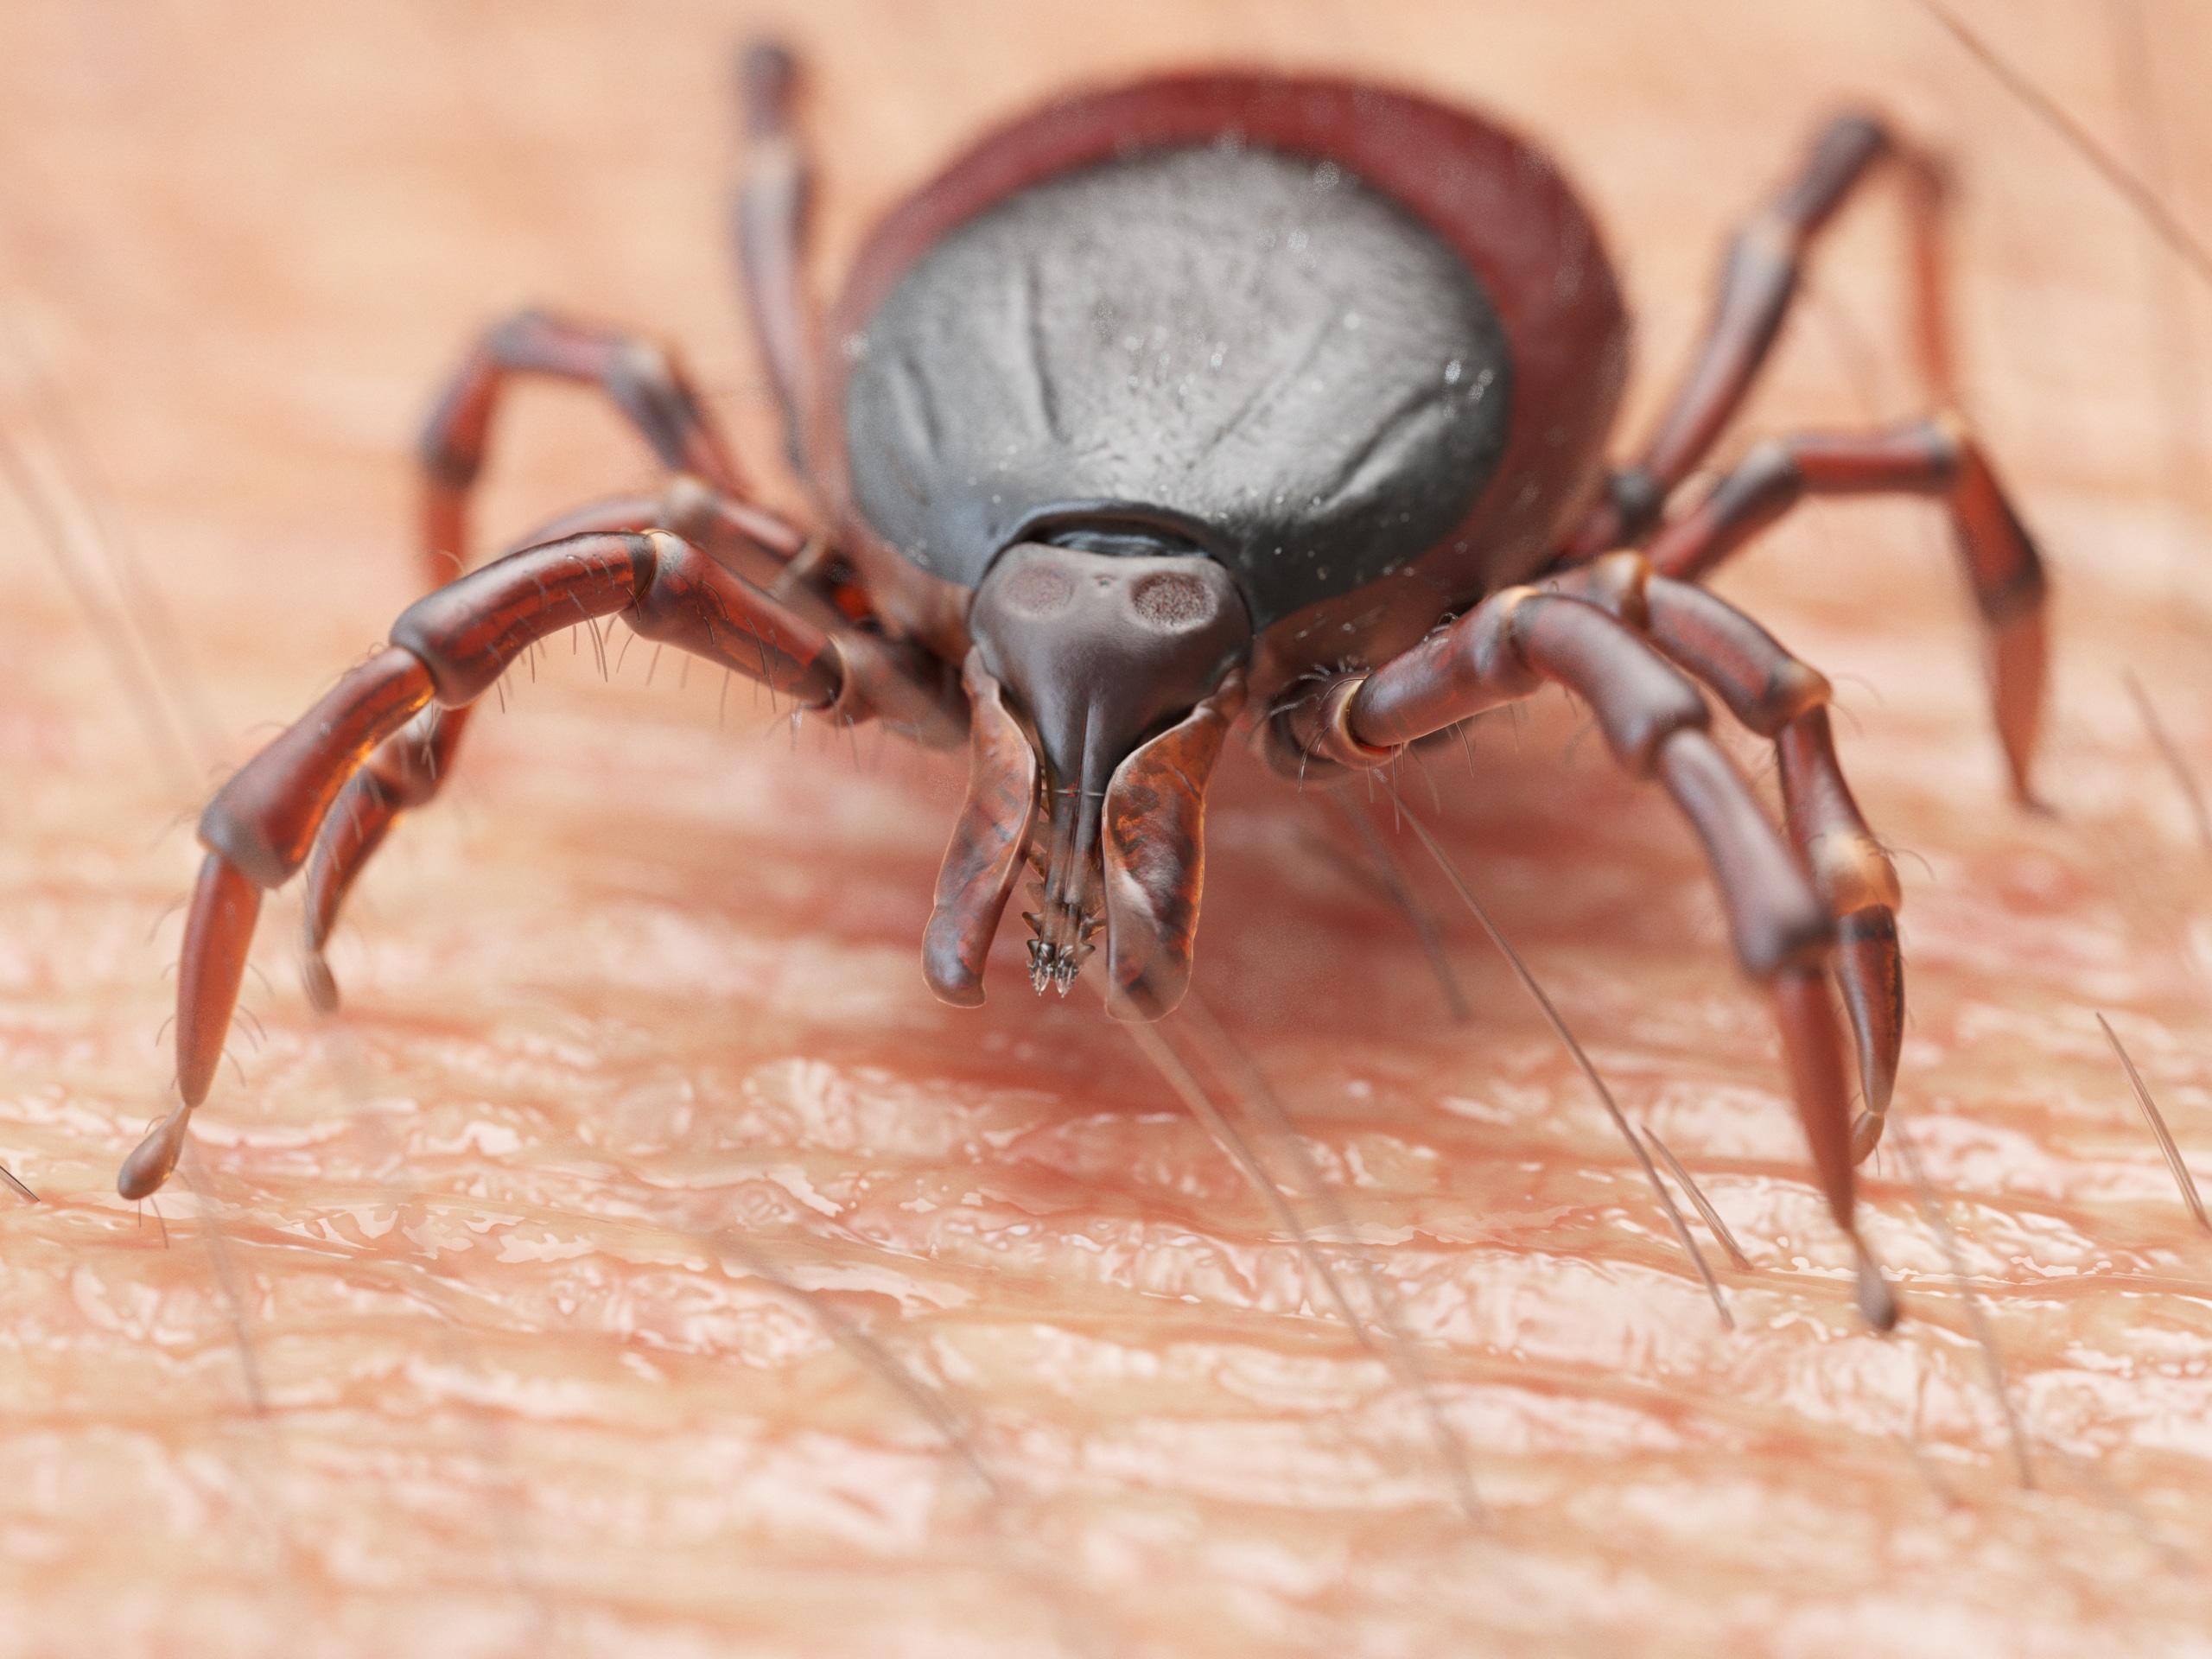 Tick exterminators